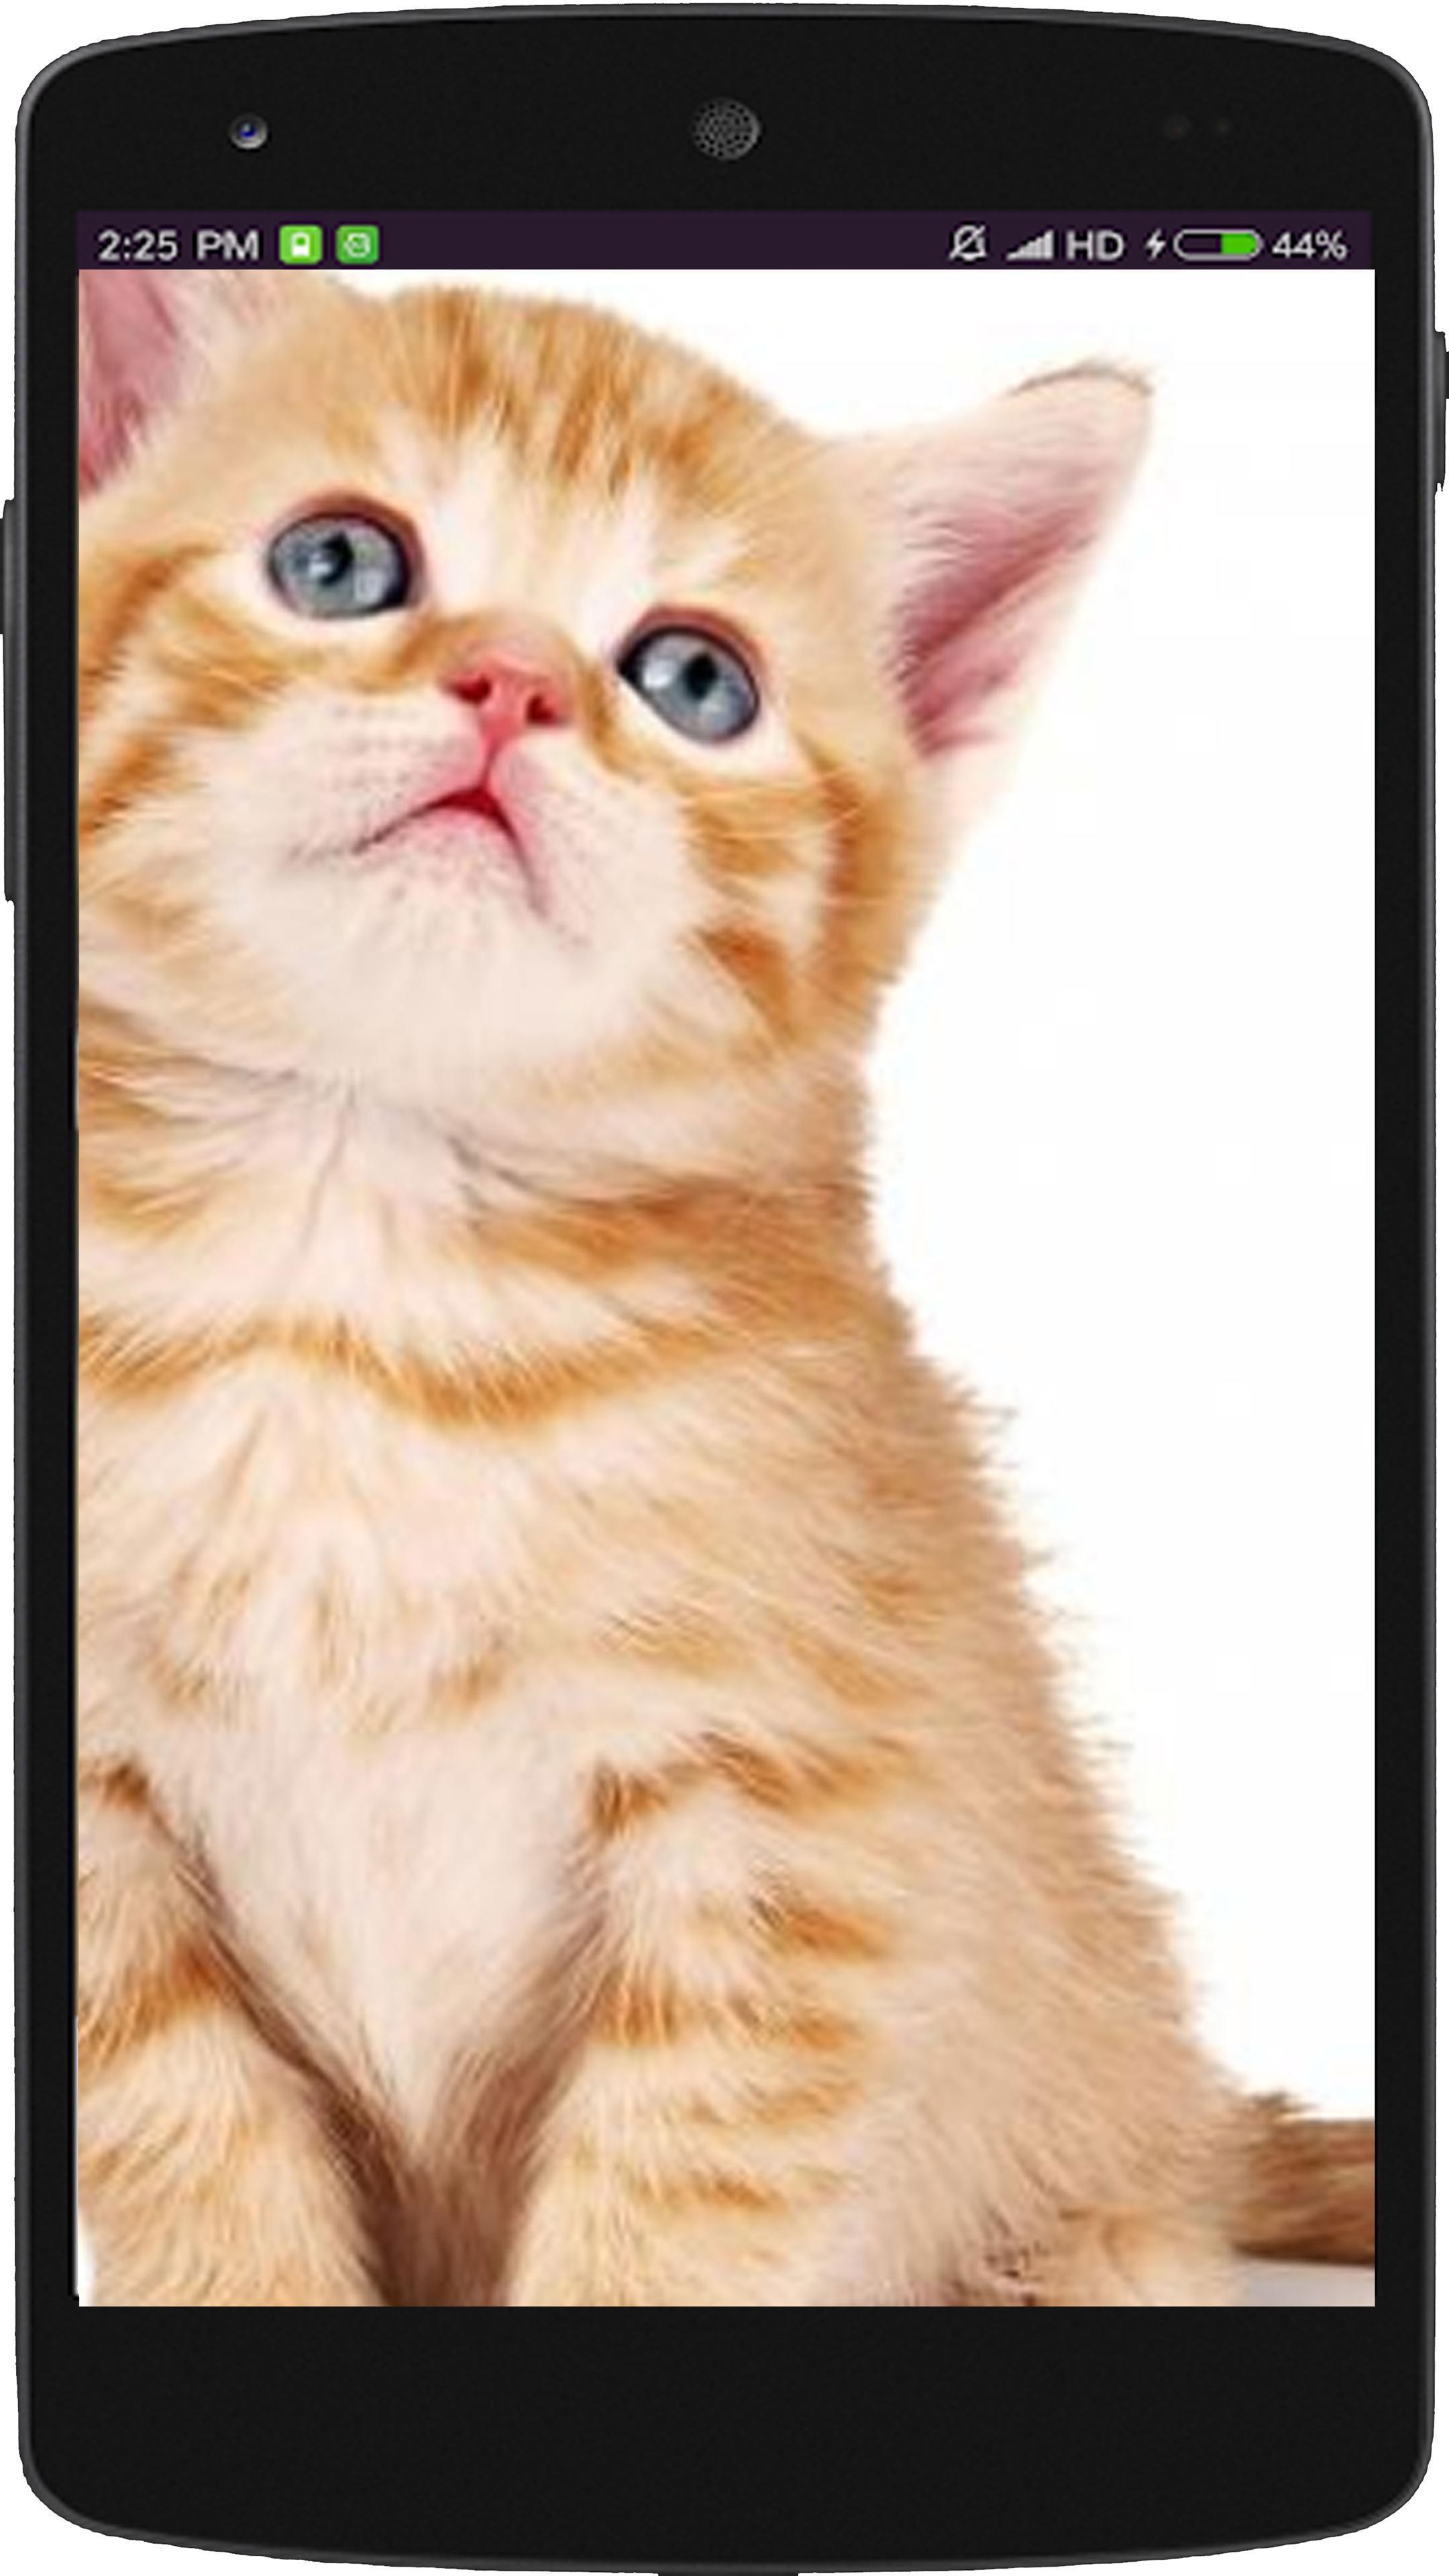 Gambar Kucing Full Hd godean.web.id